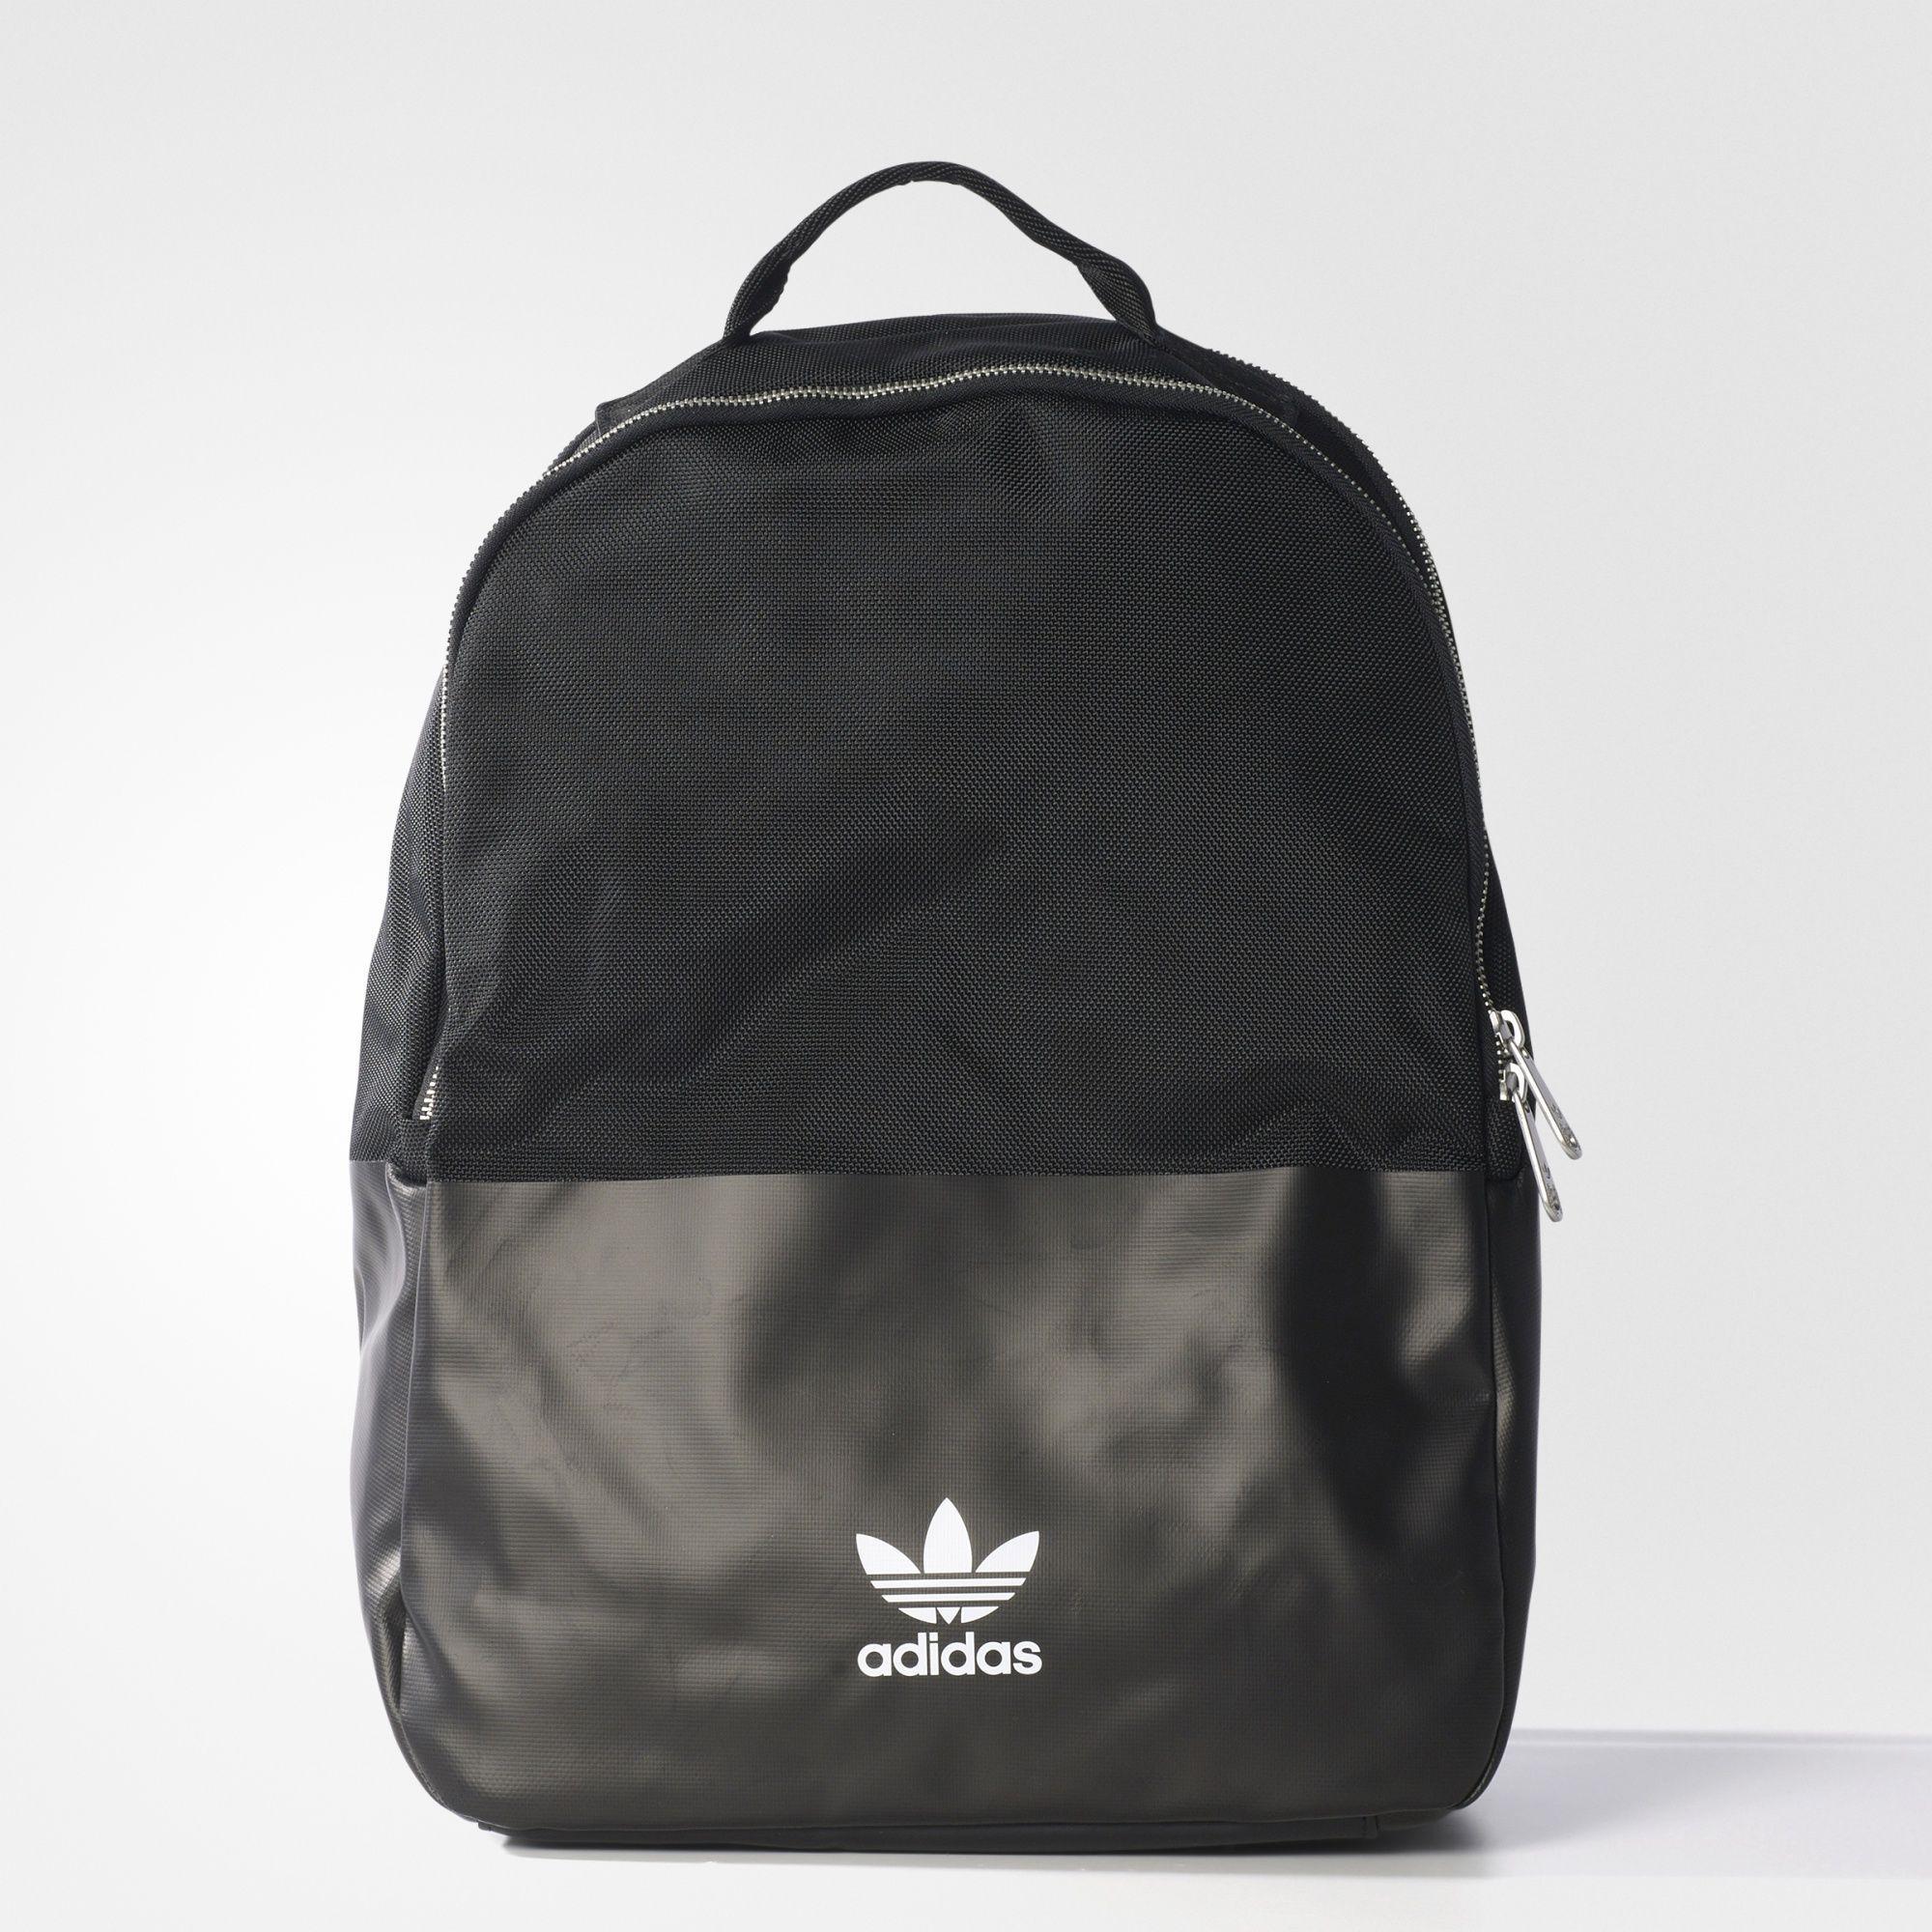 Adidas Black Backpack AZ0744